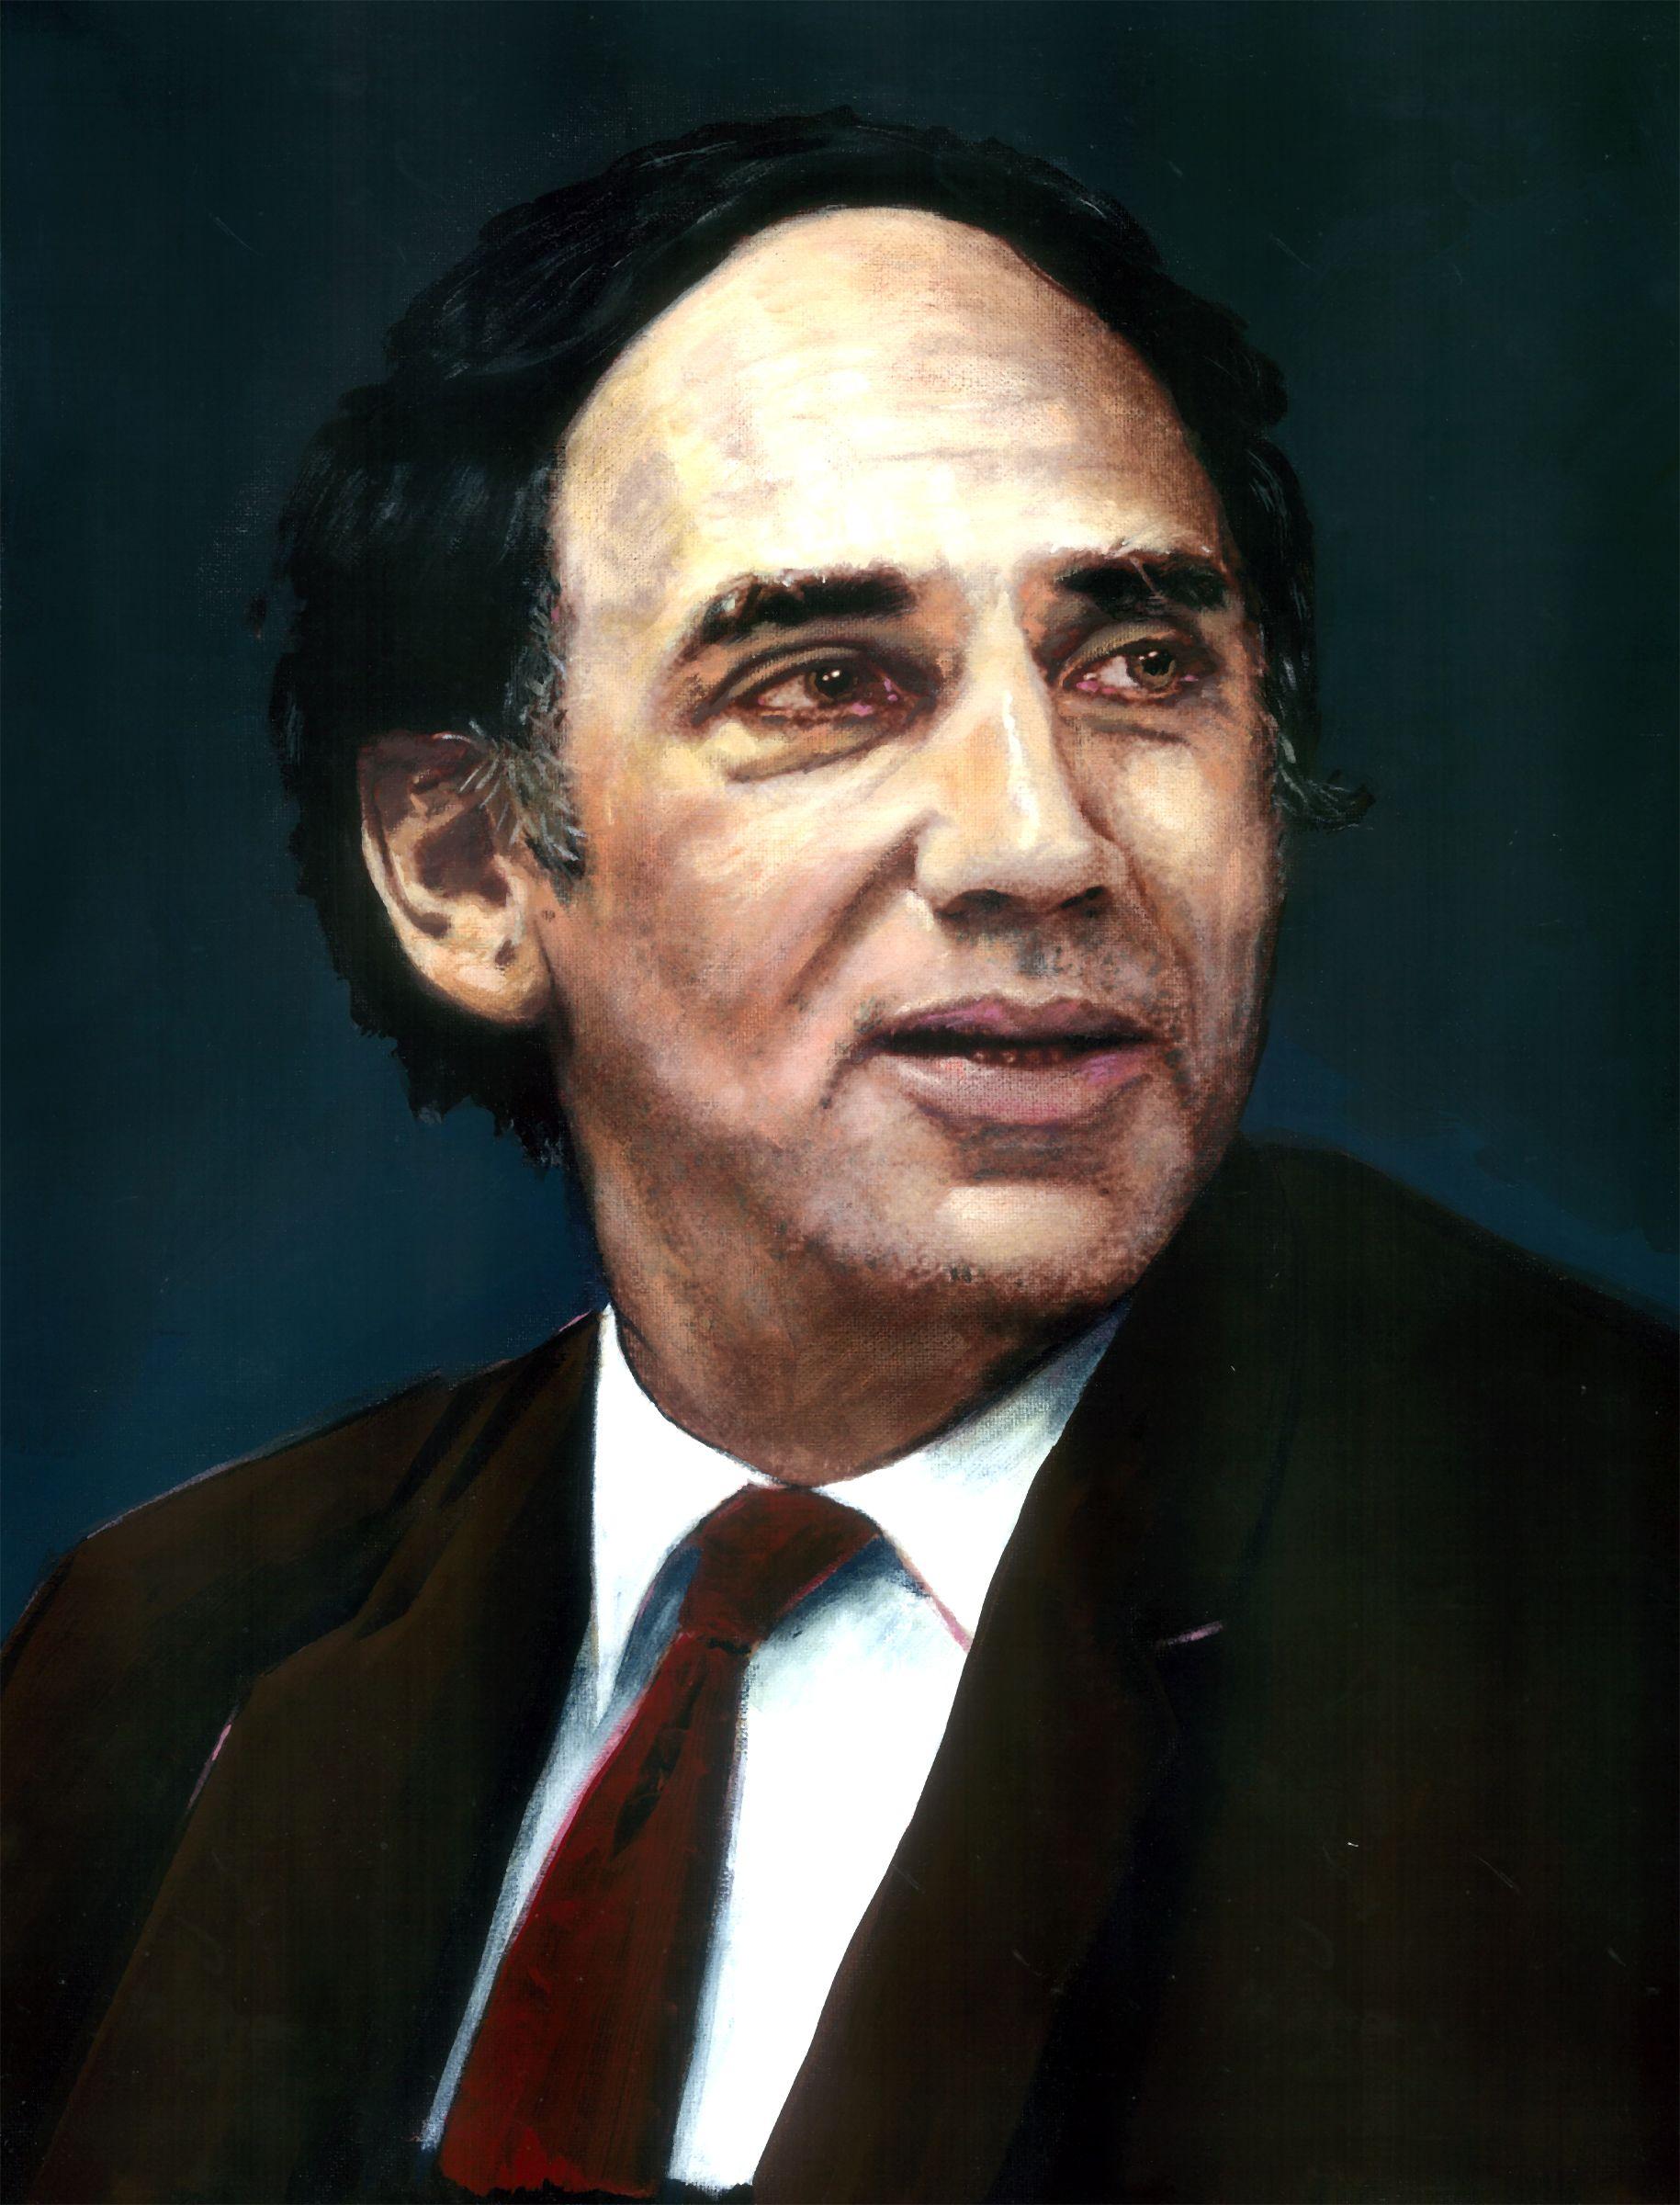 Portrait of William Kunstler.